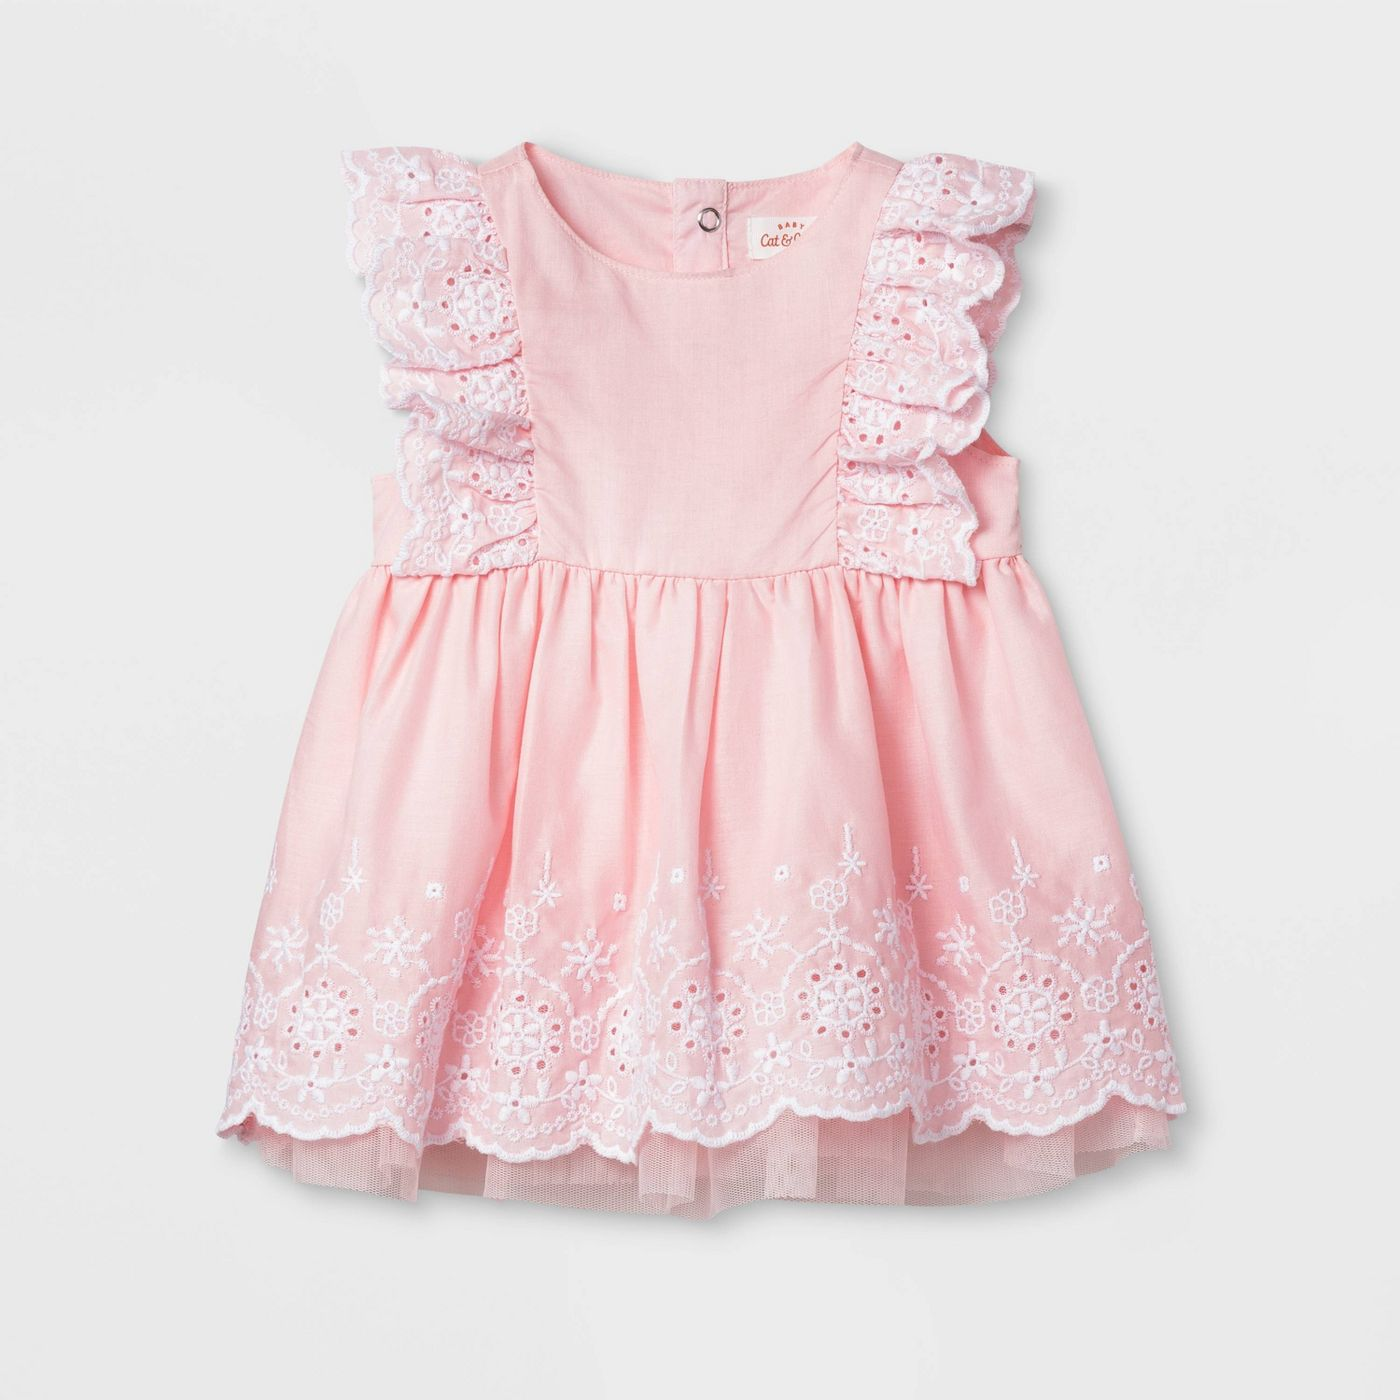 Infant Easter Dress